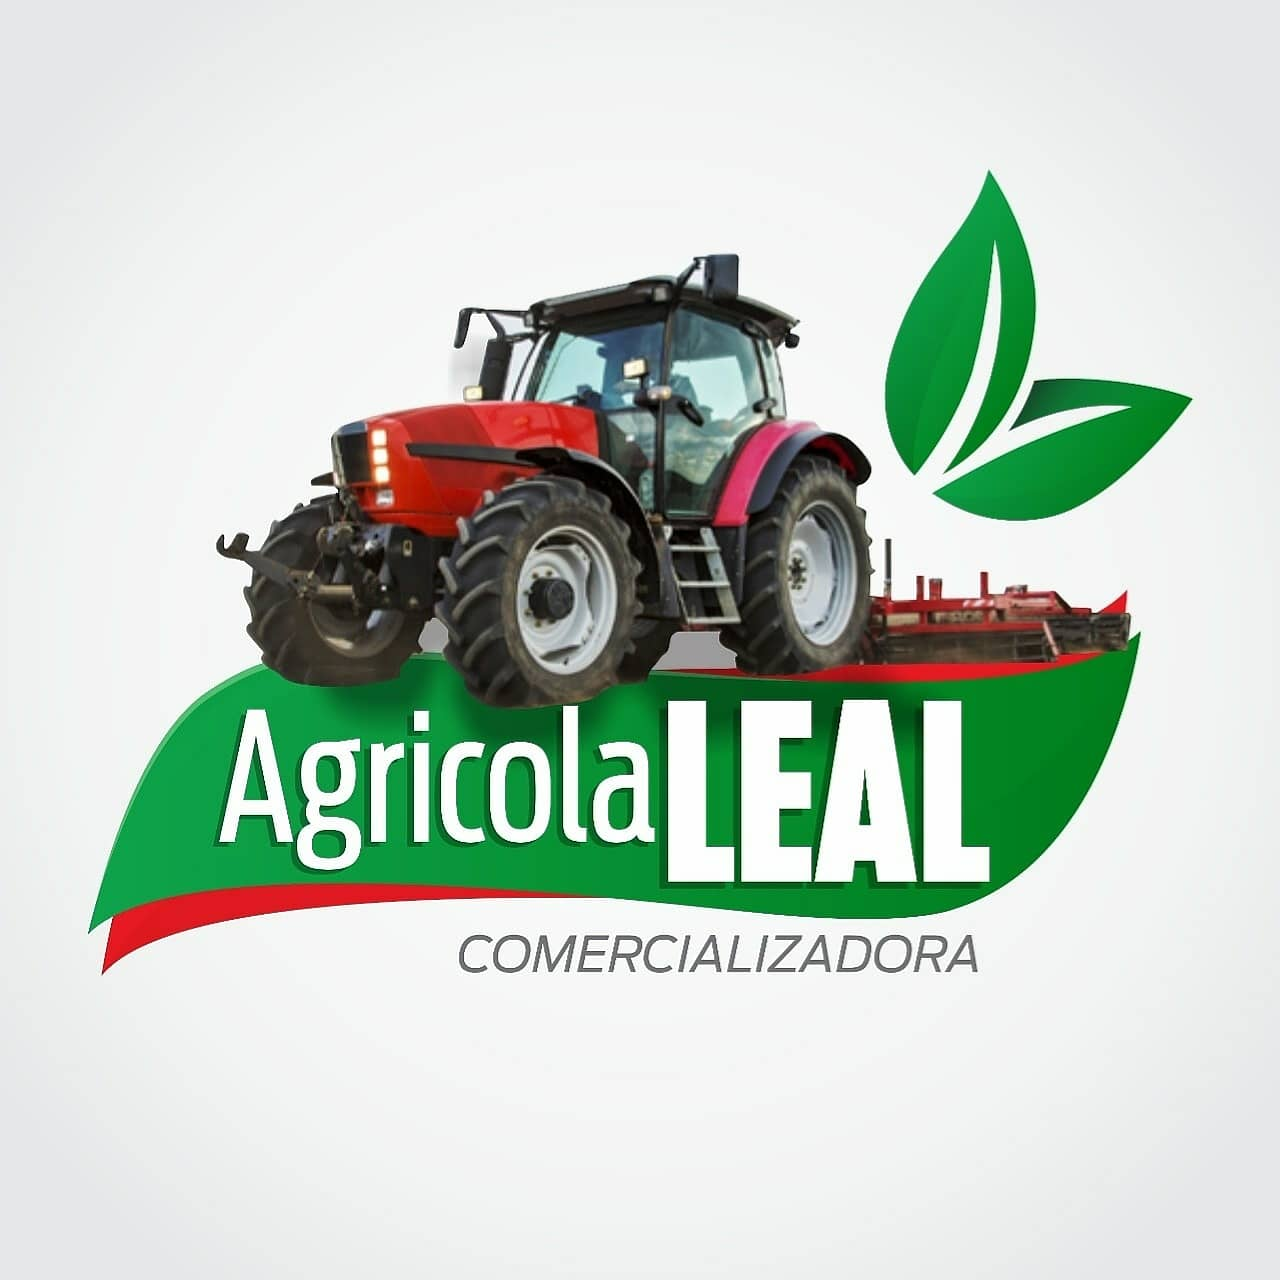 Logo vendedor destacado: AGRICOLA LEAL<